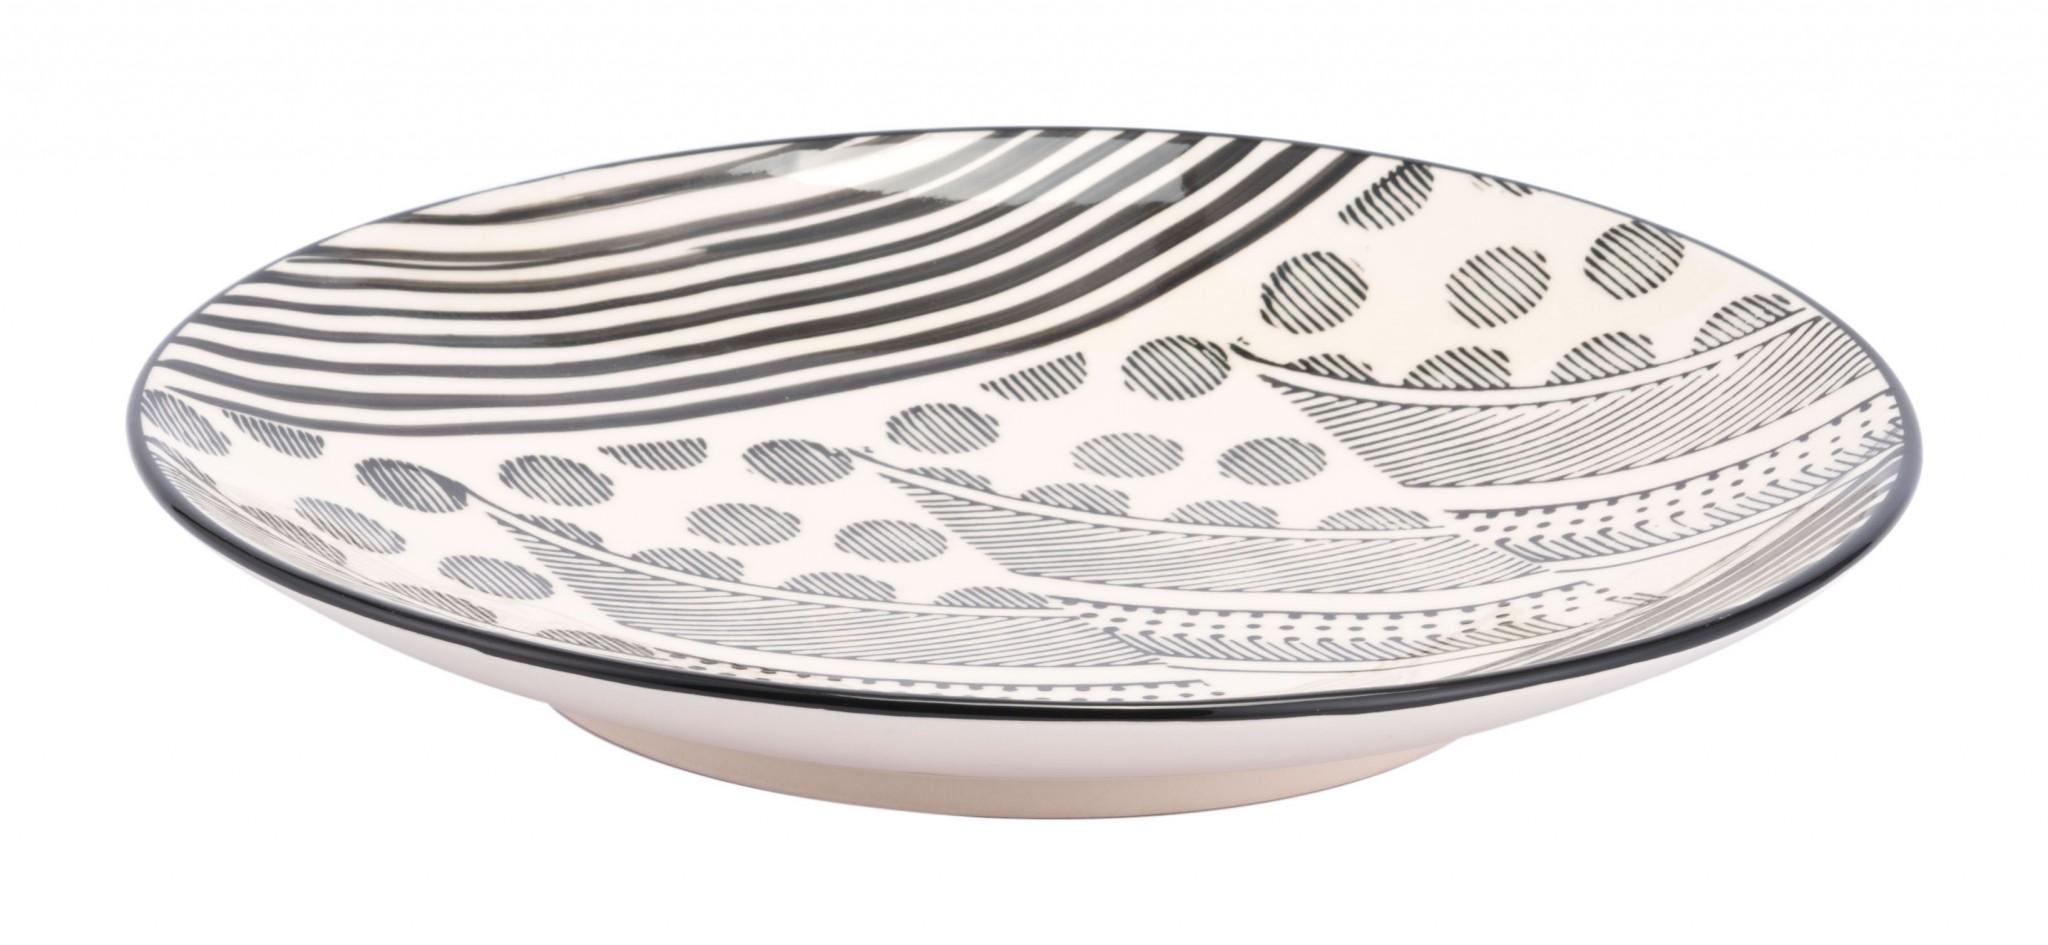 "14.2"" x 14.2"" x 2.2"" Off White & Black, Ceramic, Plate"